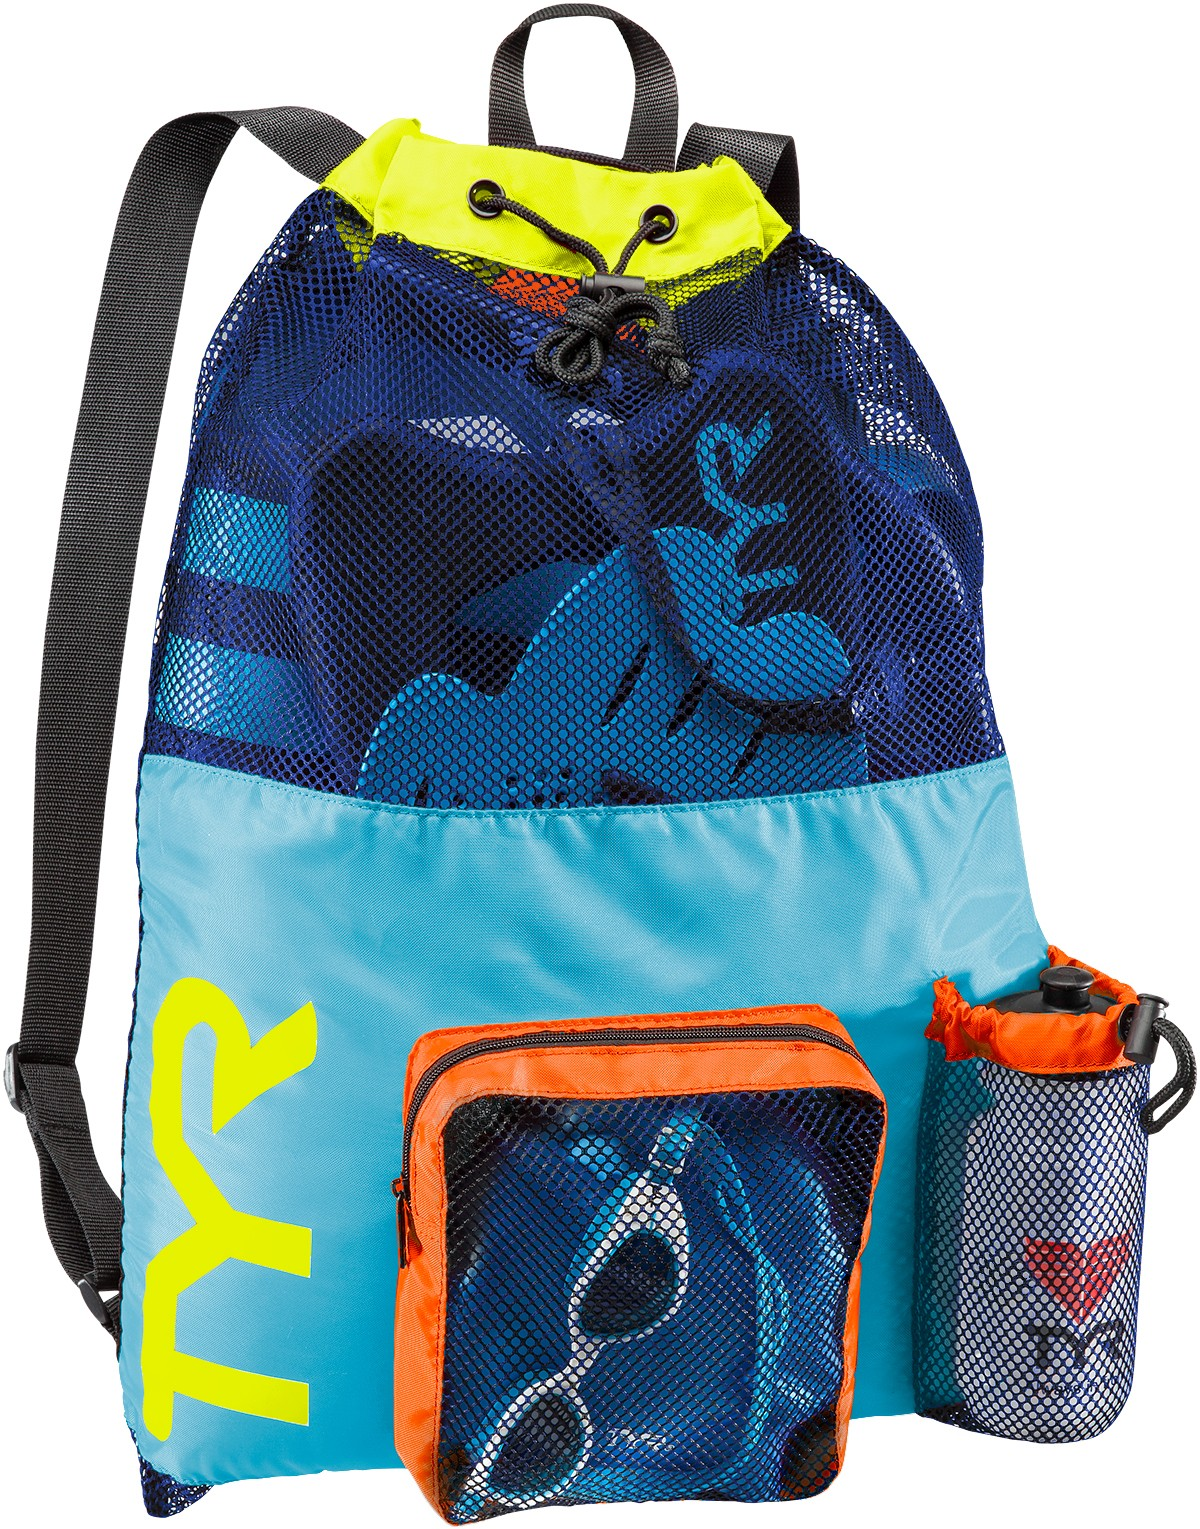 Tyr Mesh Mummy Bag 12 Colors